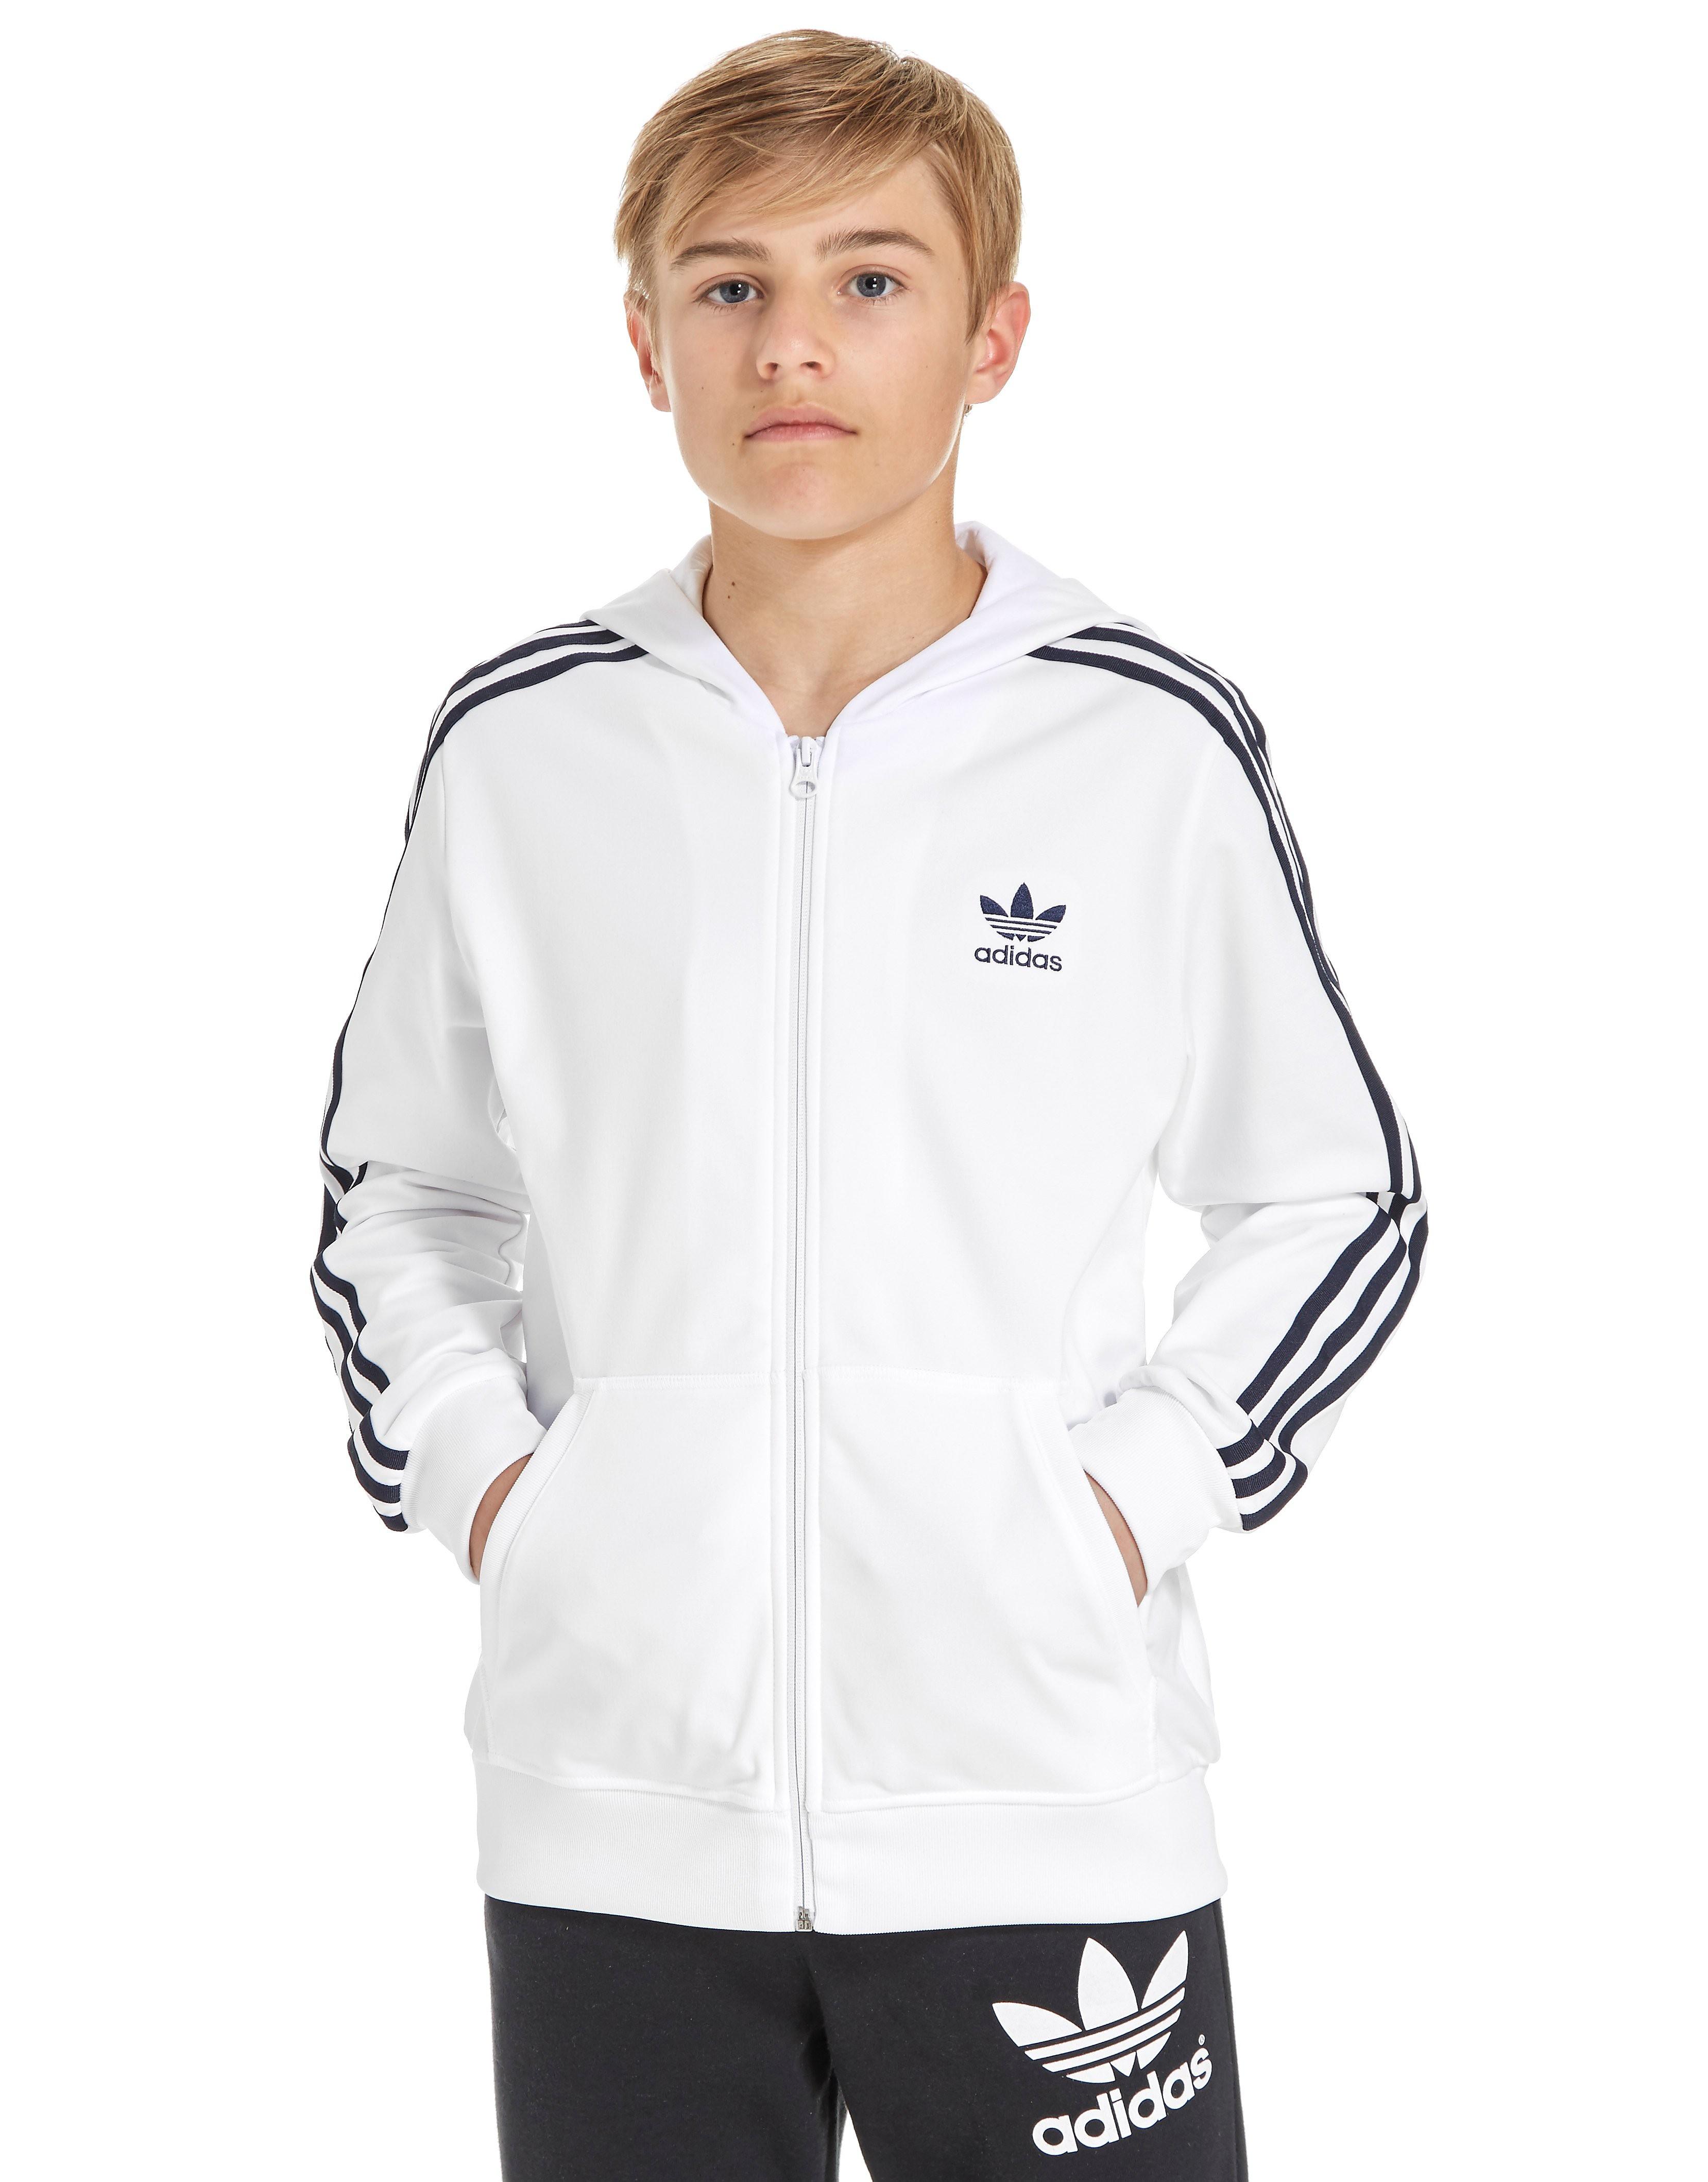 adidas Originals Full Zip Hoody Junior